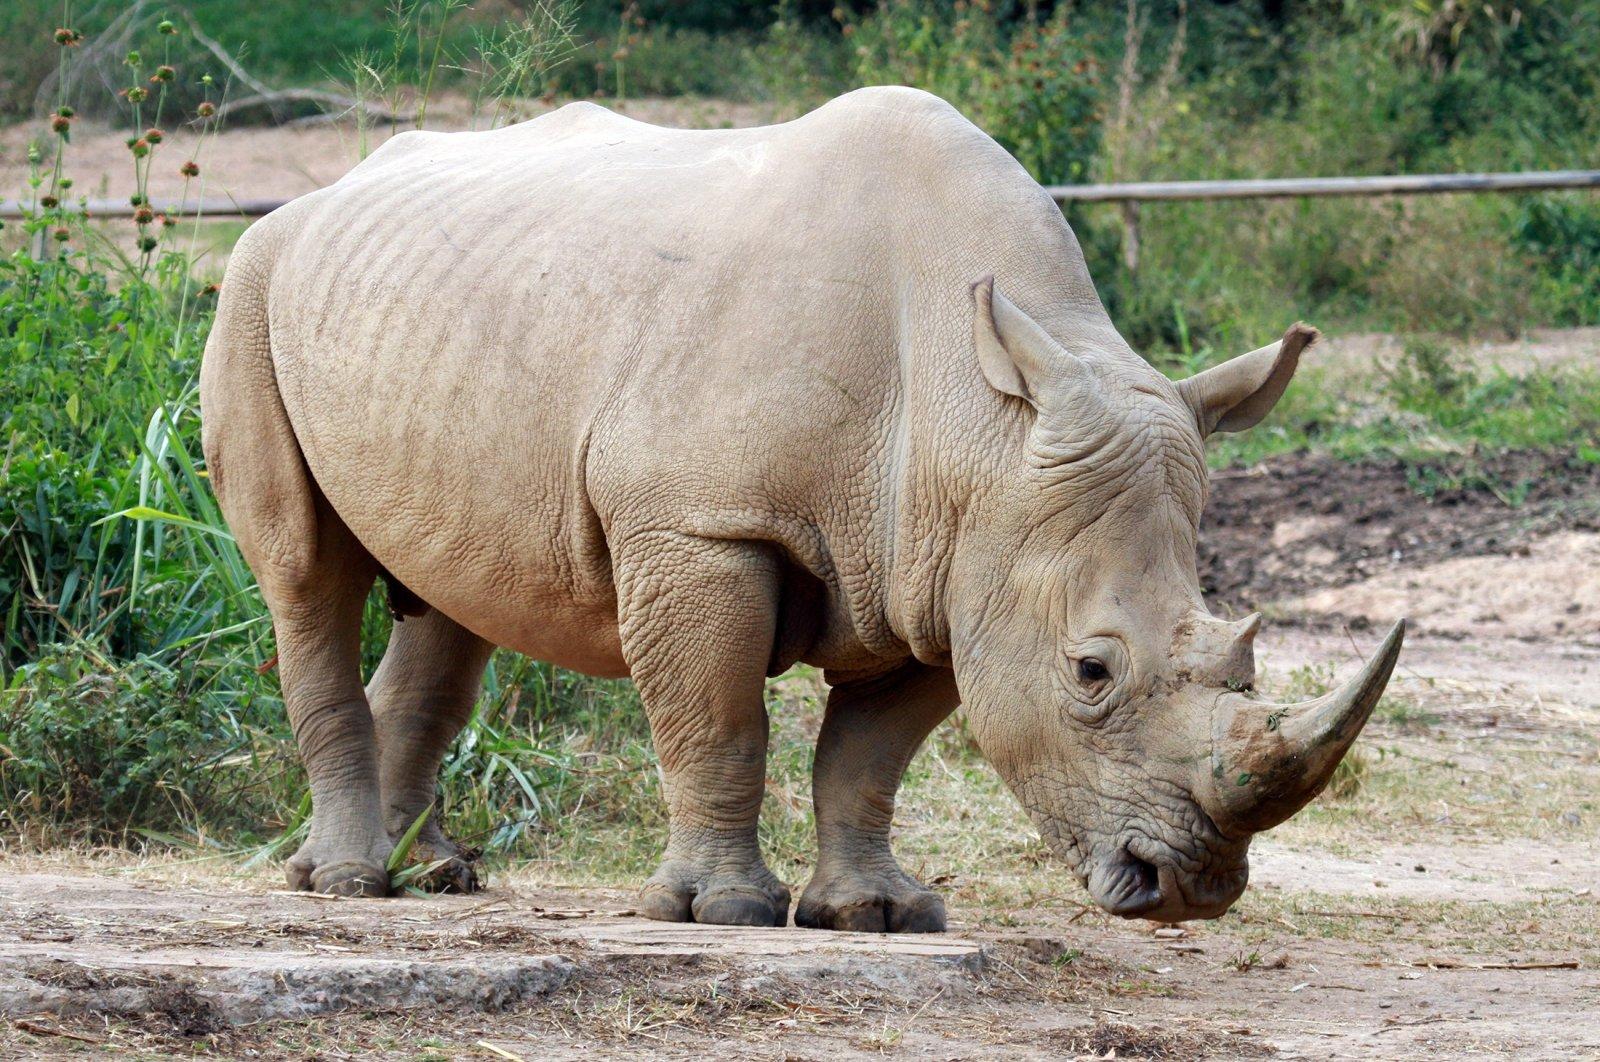 A southern white rhinoceros in Uganda (Shutterstock Photo)